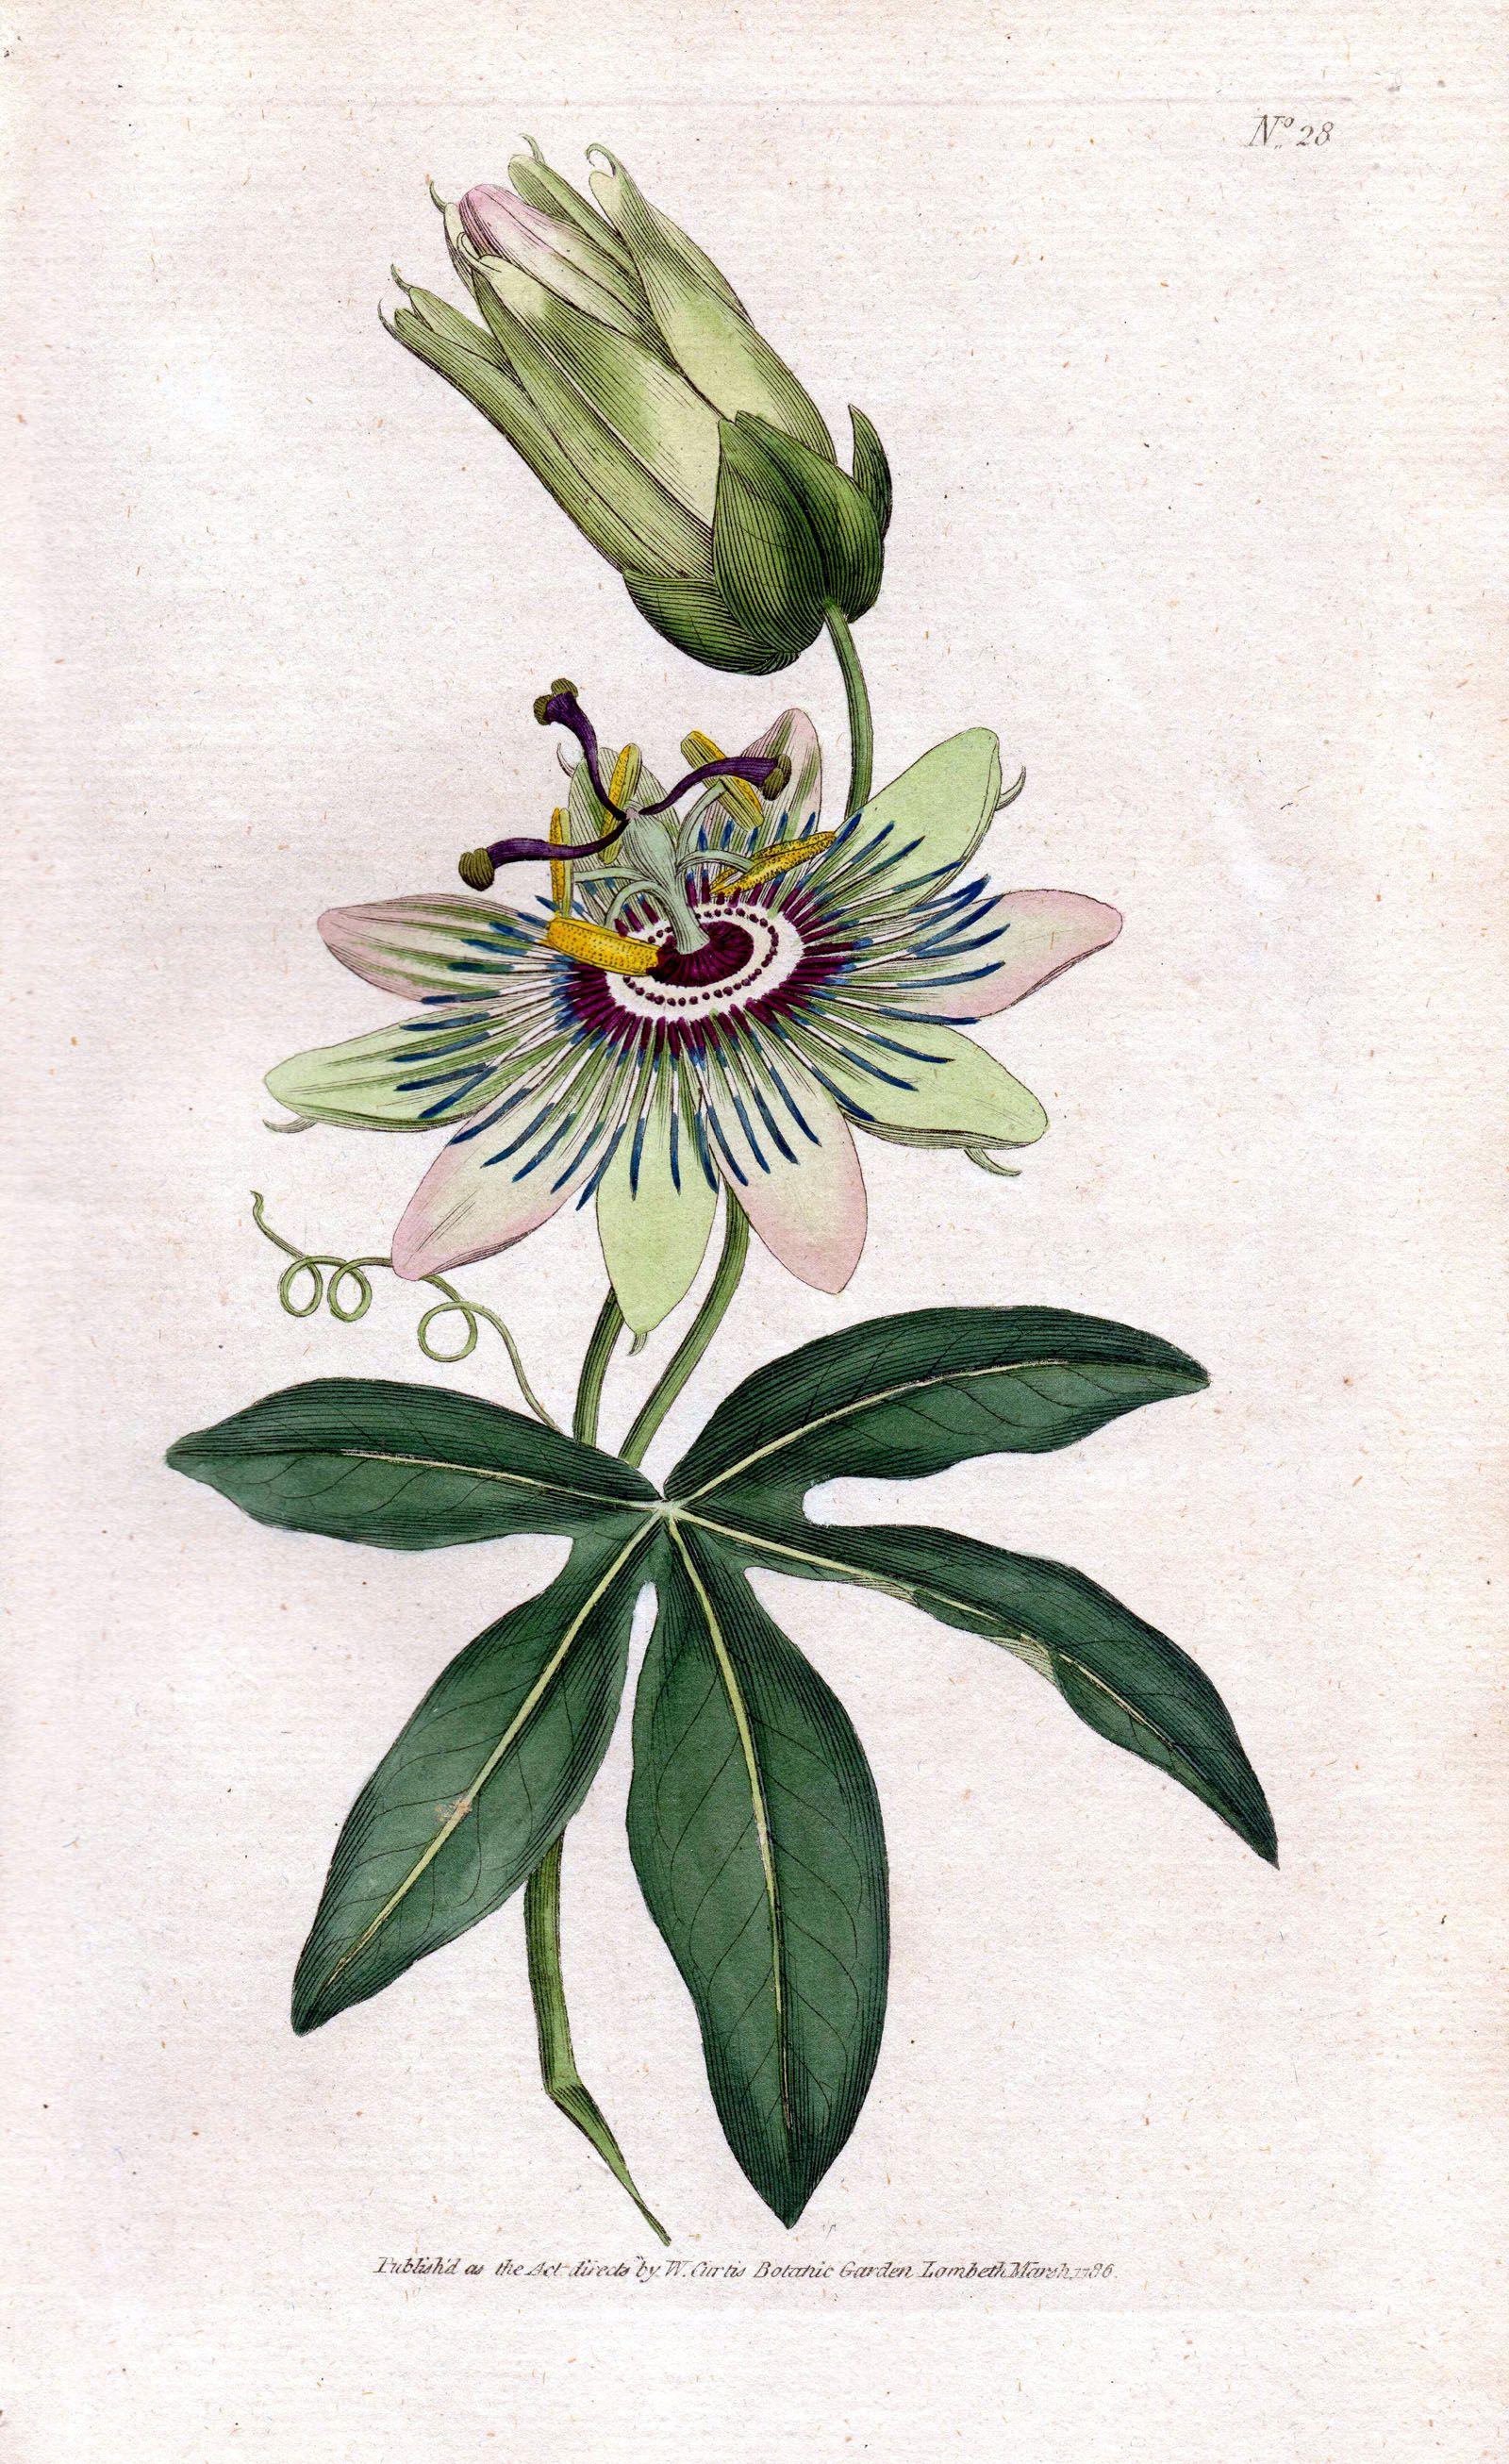 Passionflower Passiflora Passiflora Caerulea Blue Passionflower Bluecrown Passionflower Passion Botanical Illustration Botanical Prints Botanical Drawings